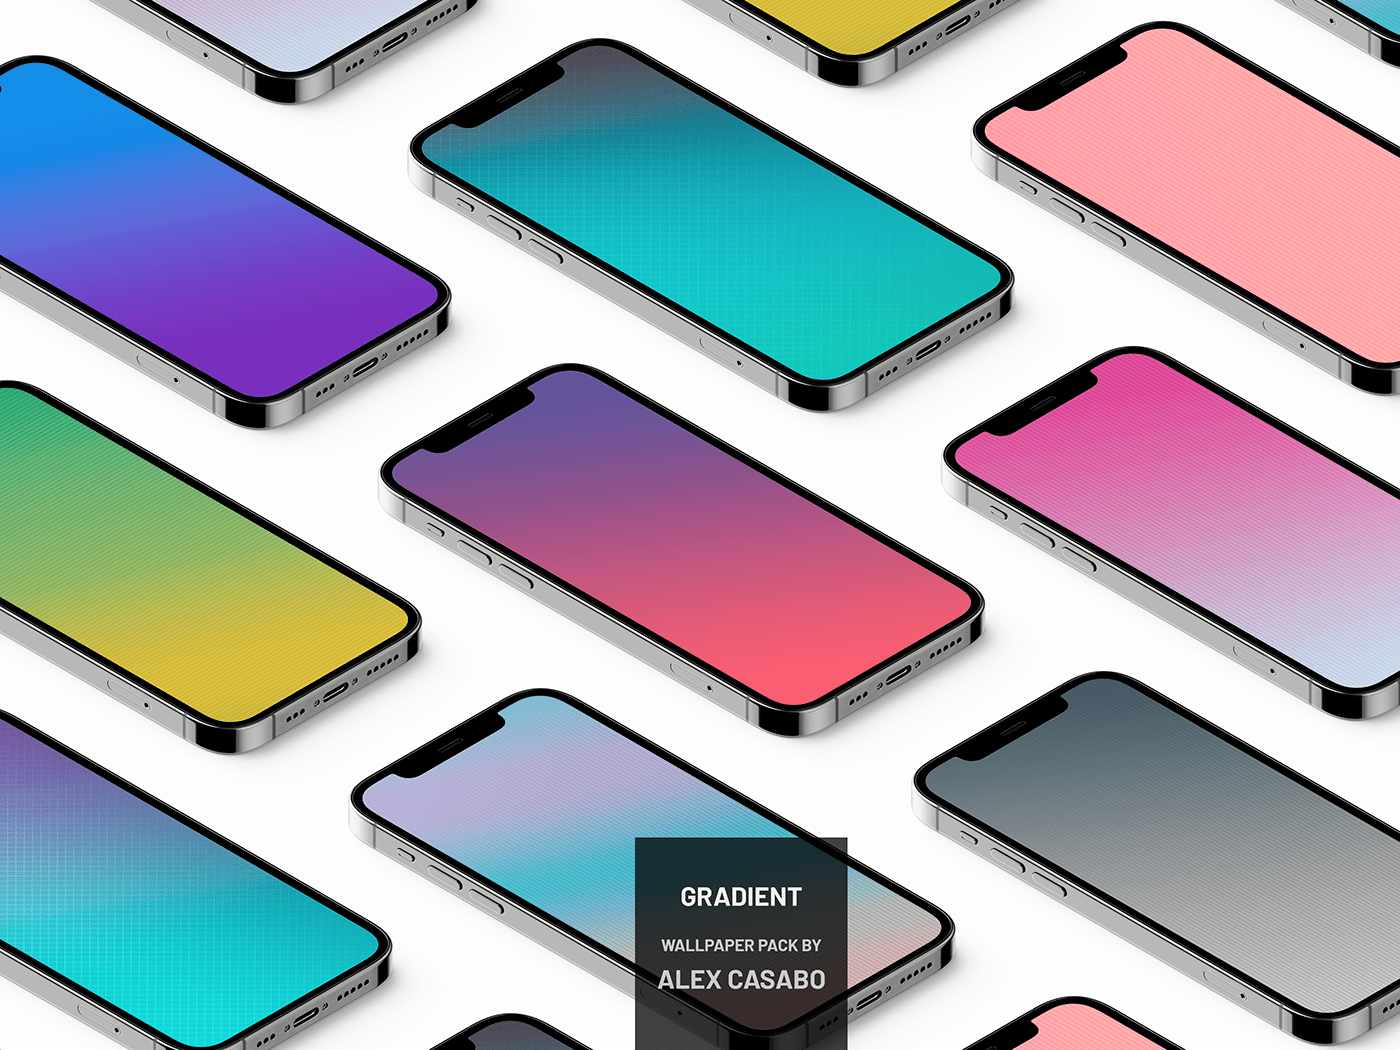 5k 5k wallpaper fondo de pantalla geometric gradient gumroad minimal minimal wallpaper wallpaper Wallpapers